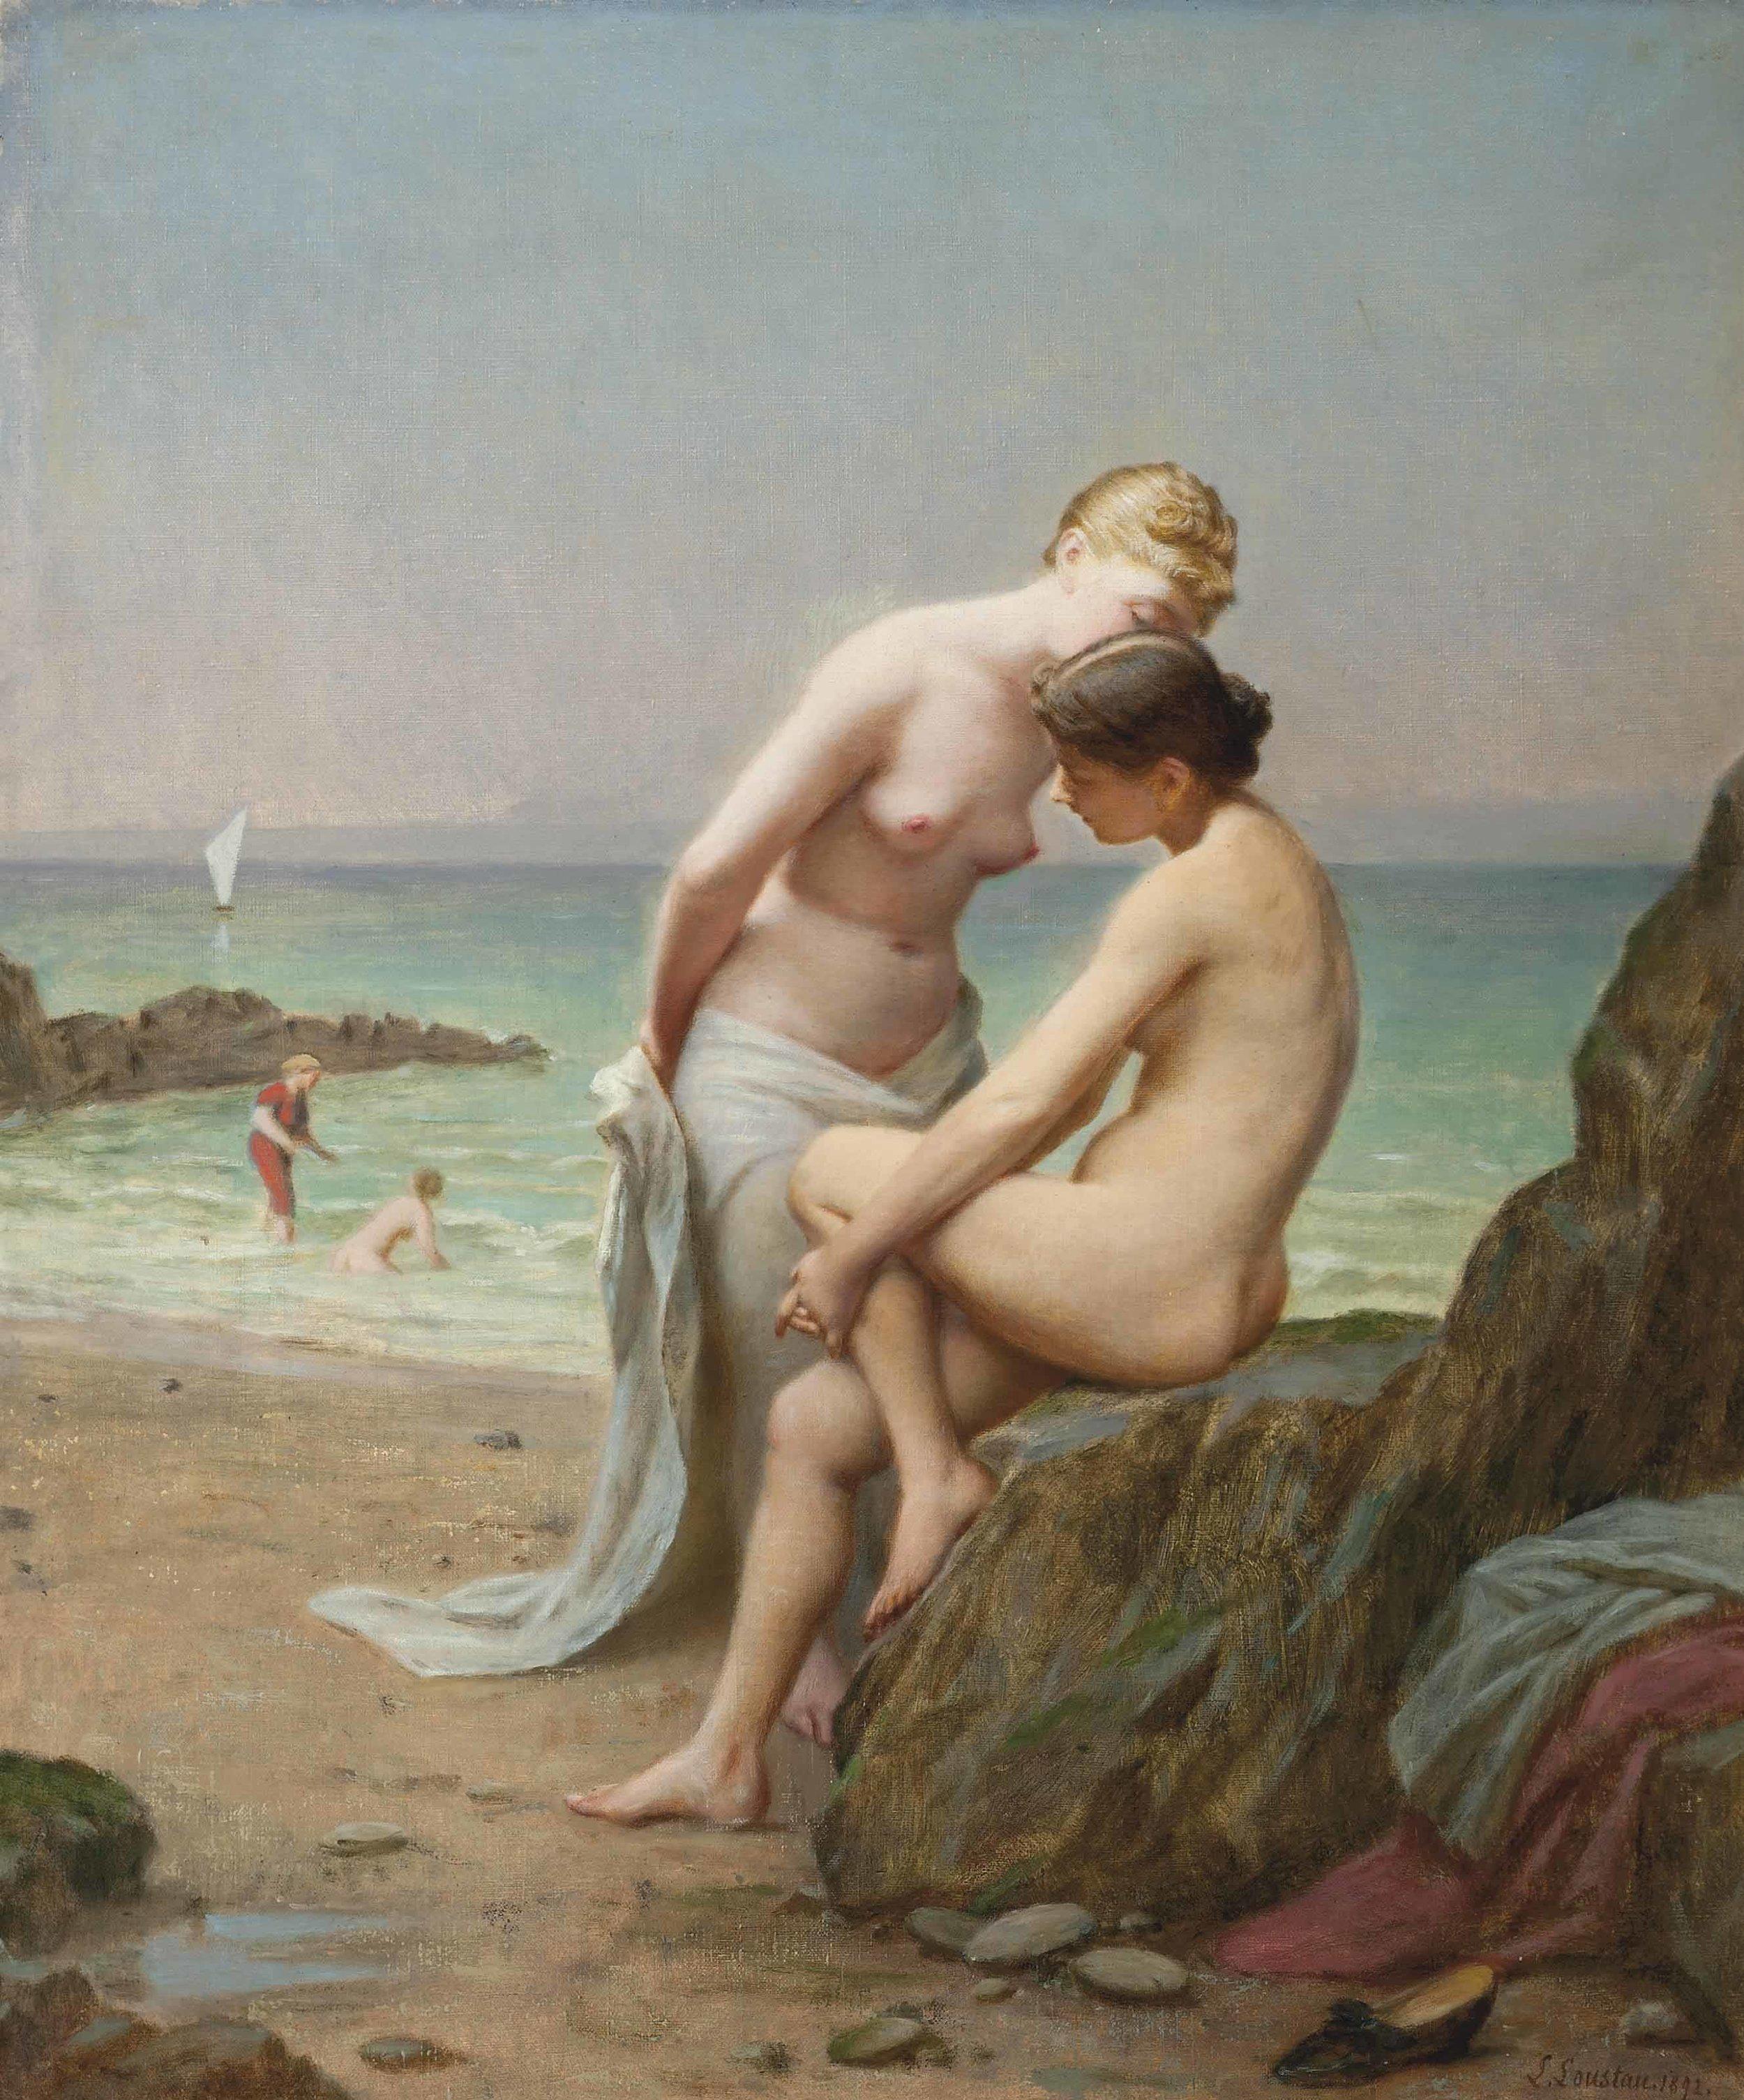 Secrets on the shore - Jacques Joseph Léopold Loustau (1892)